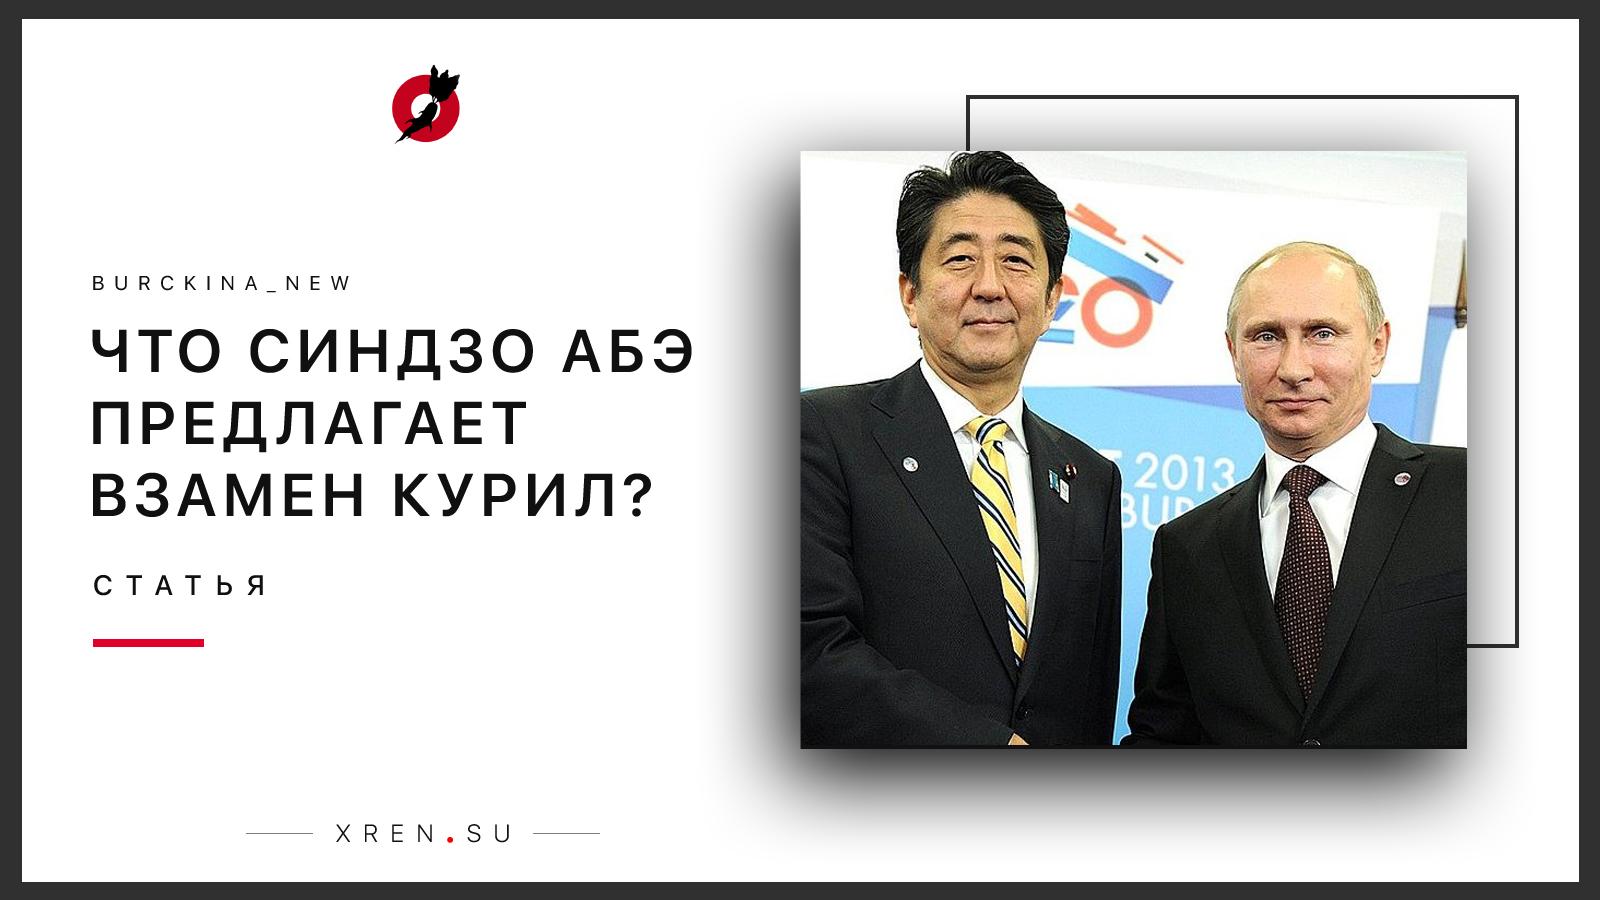 Что Синдзо Абэ предлагает взамен Курил?